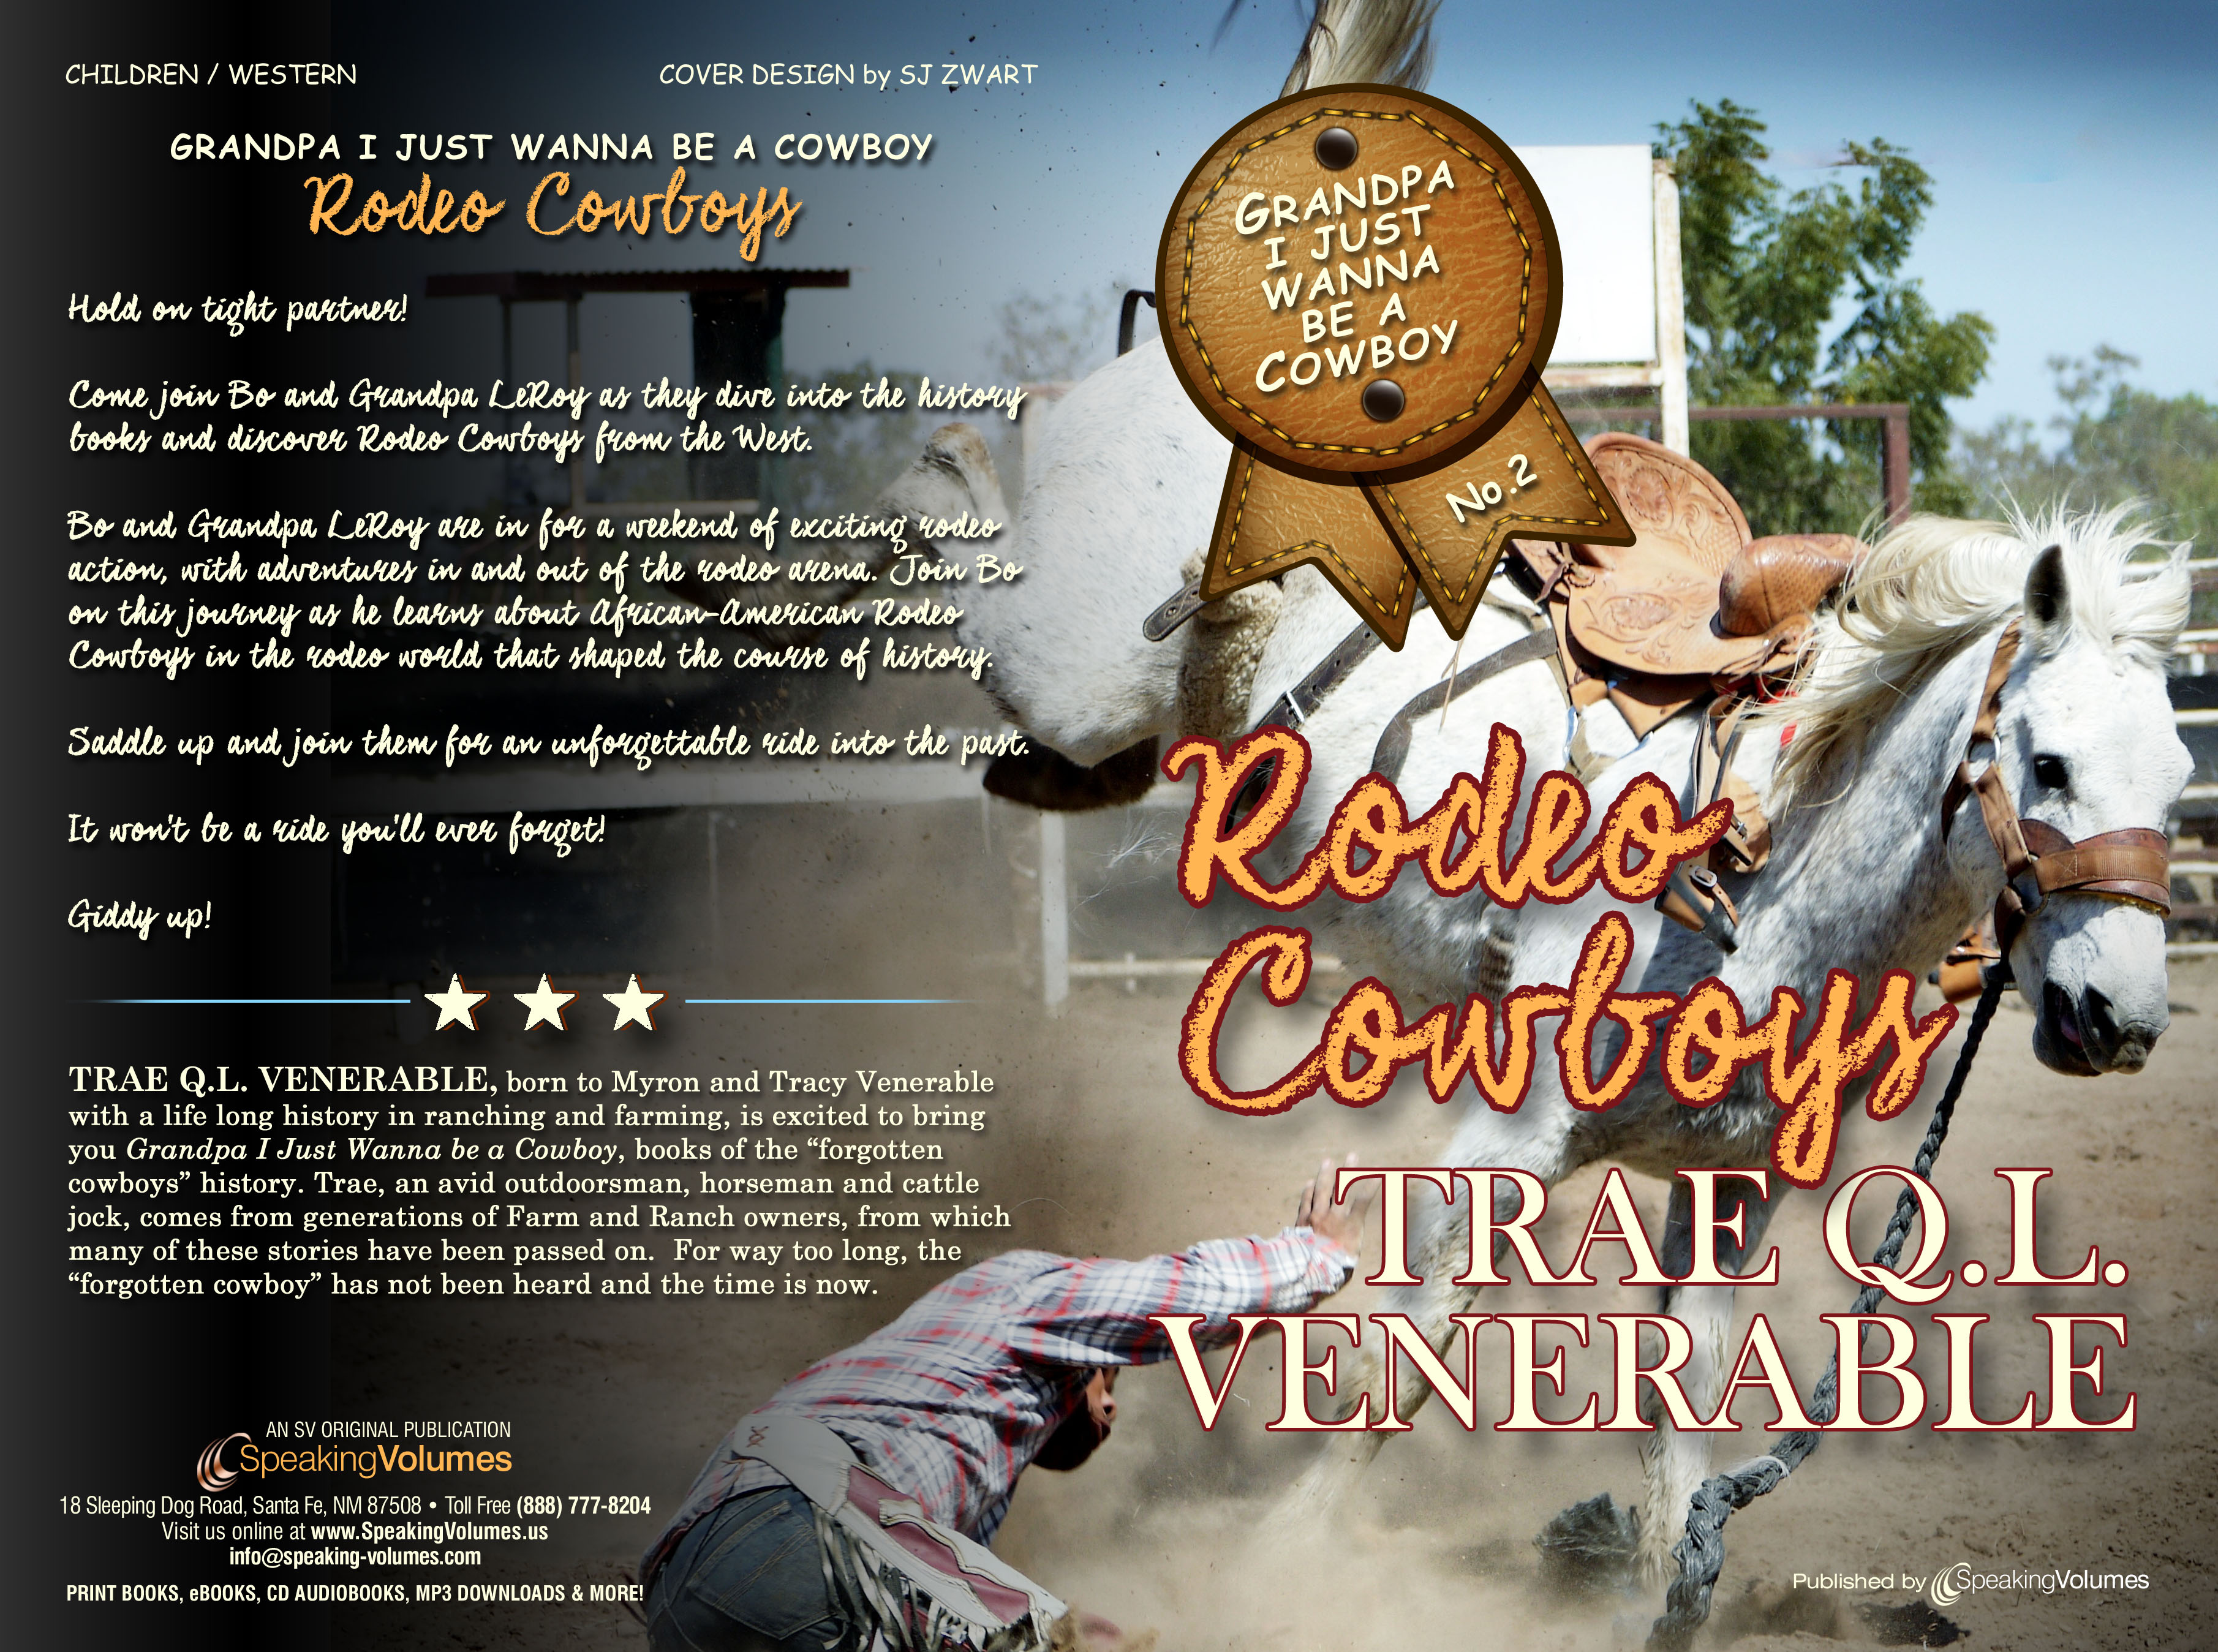 GIJWBAC 2- Rodeo Cowboys